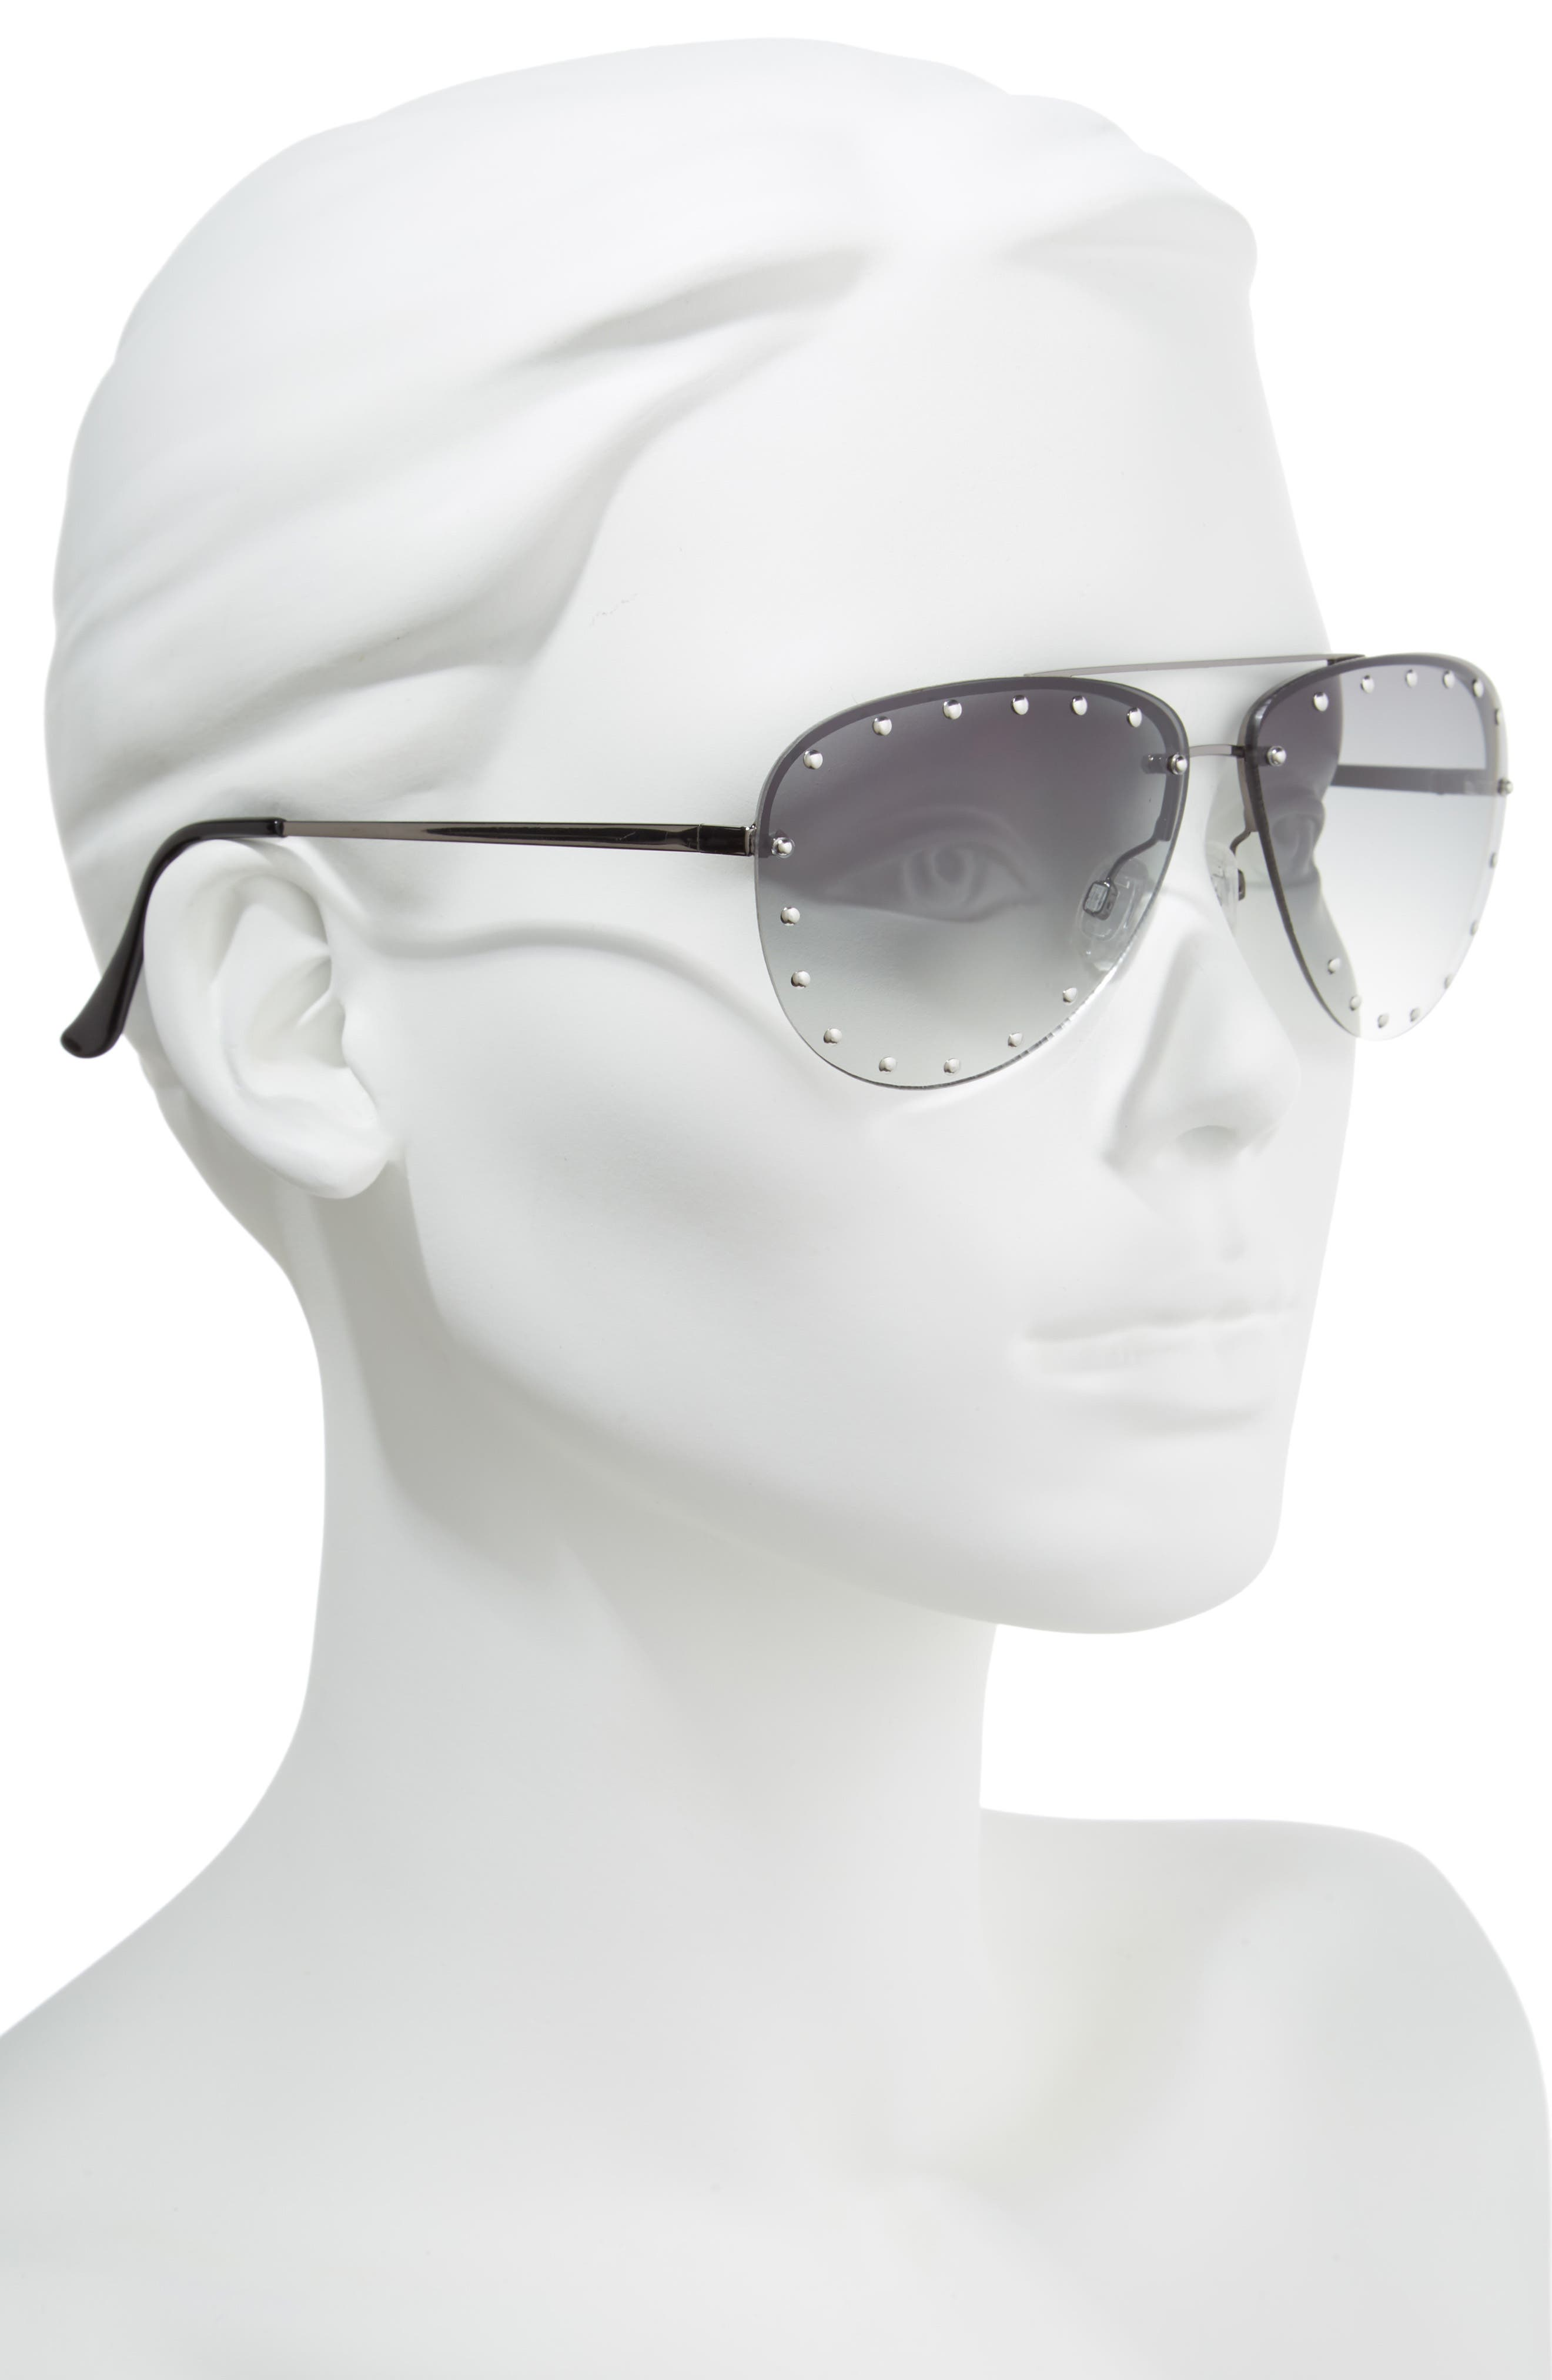 63mm Studded Aviator Sunglasses,                             Alternate thumbnail 2, color,                             Silver/ Green